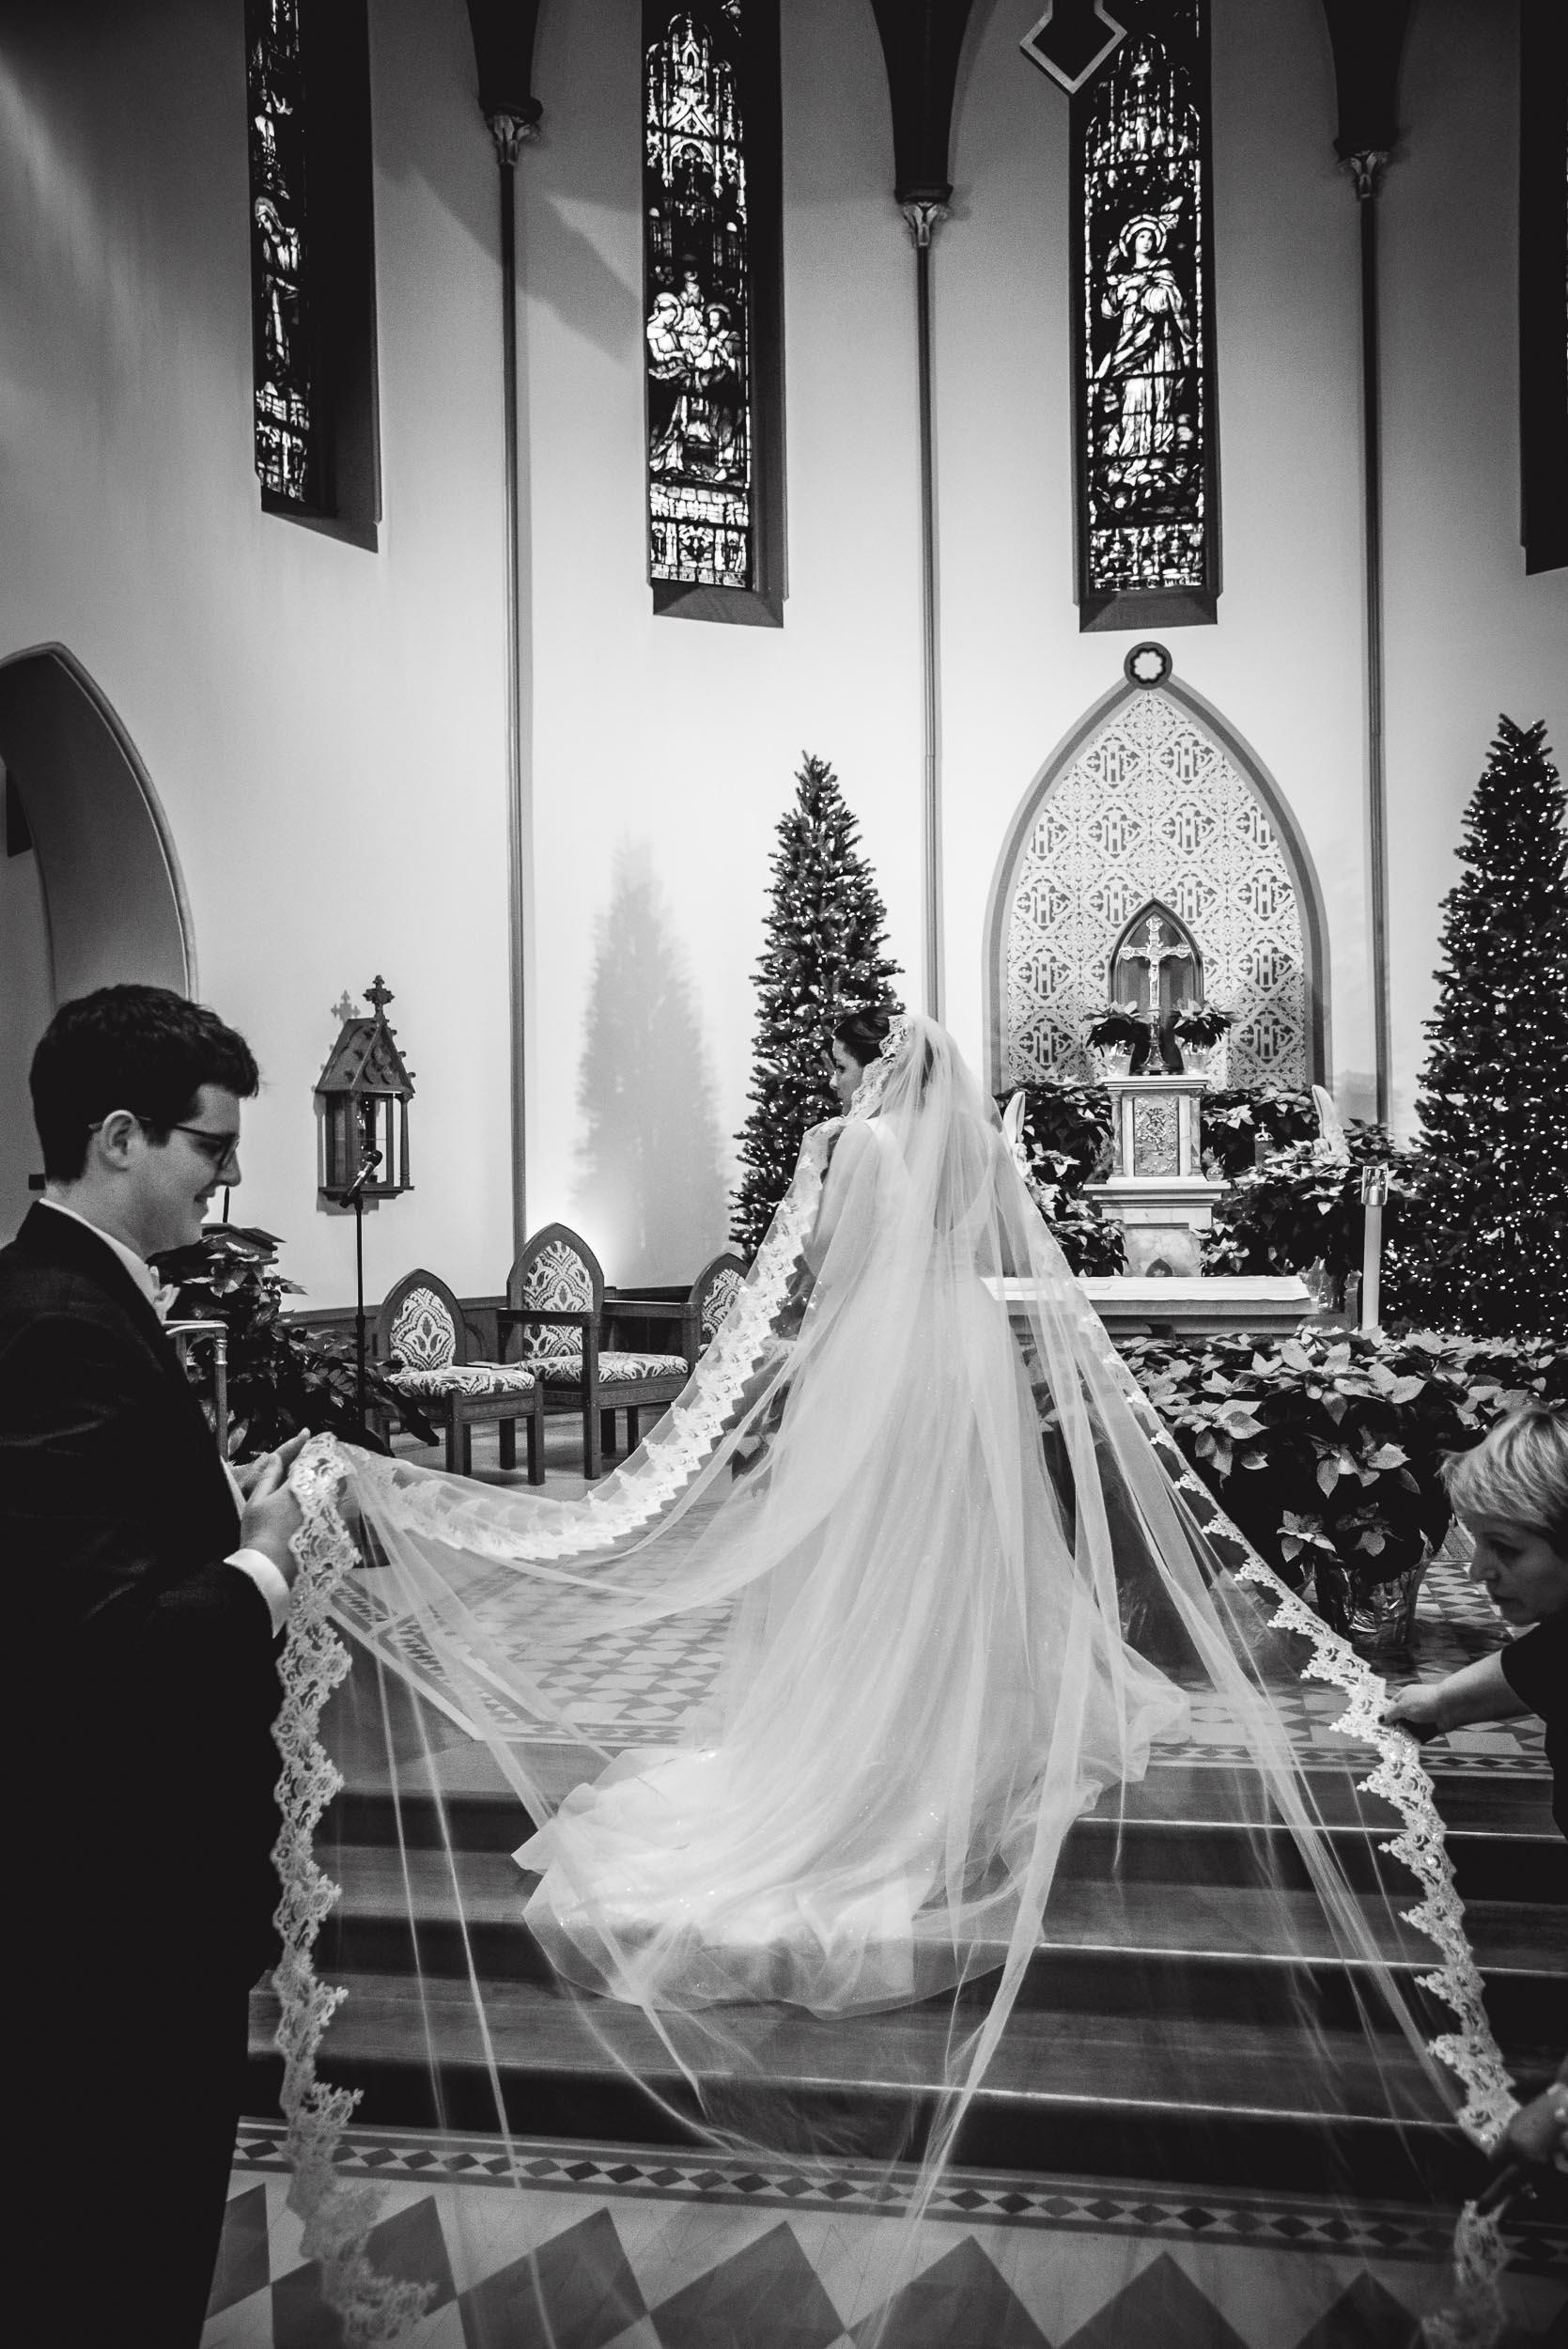 KatieandMathias_Morristown_NewJersey_Wedding_Church_Assumption_Madison_Hotel(43of65).jpg